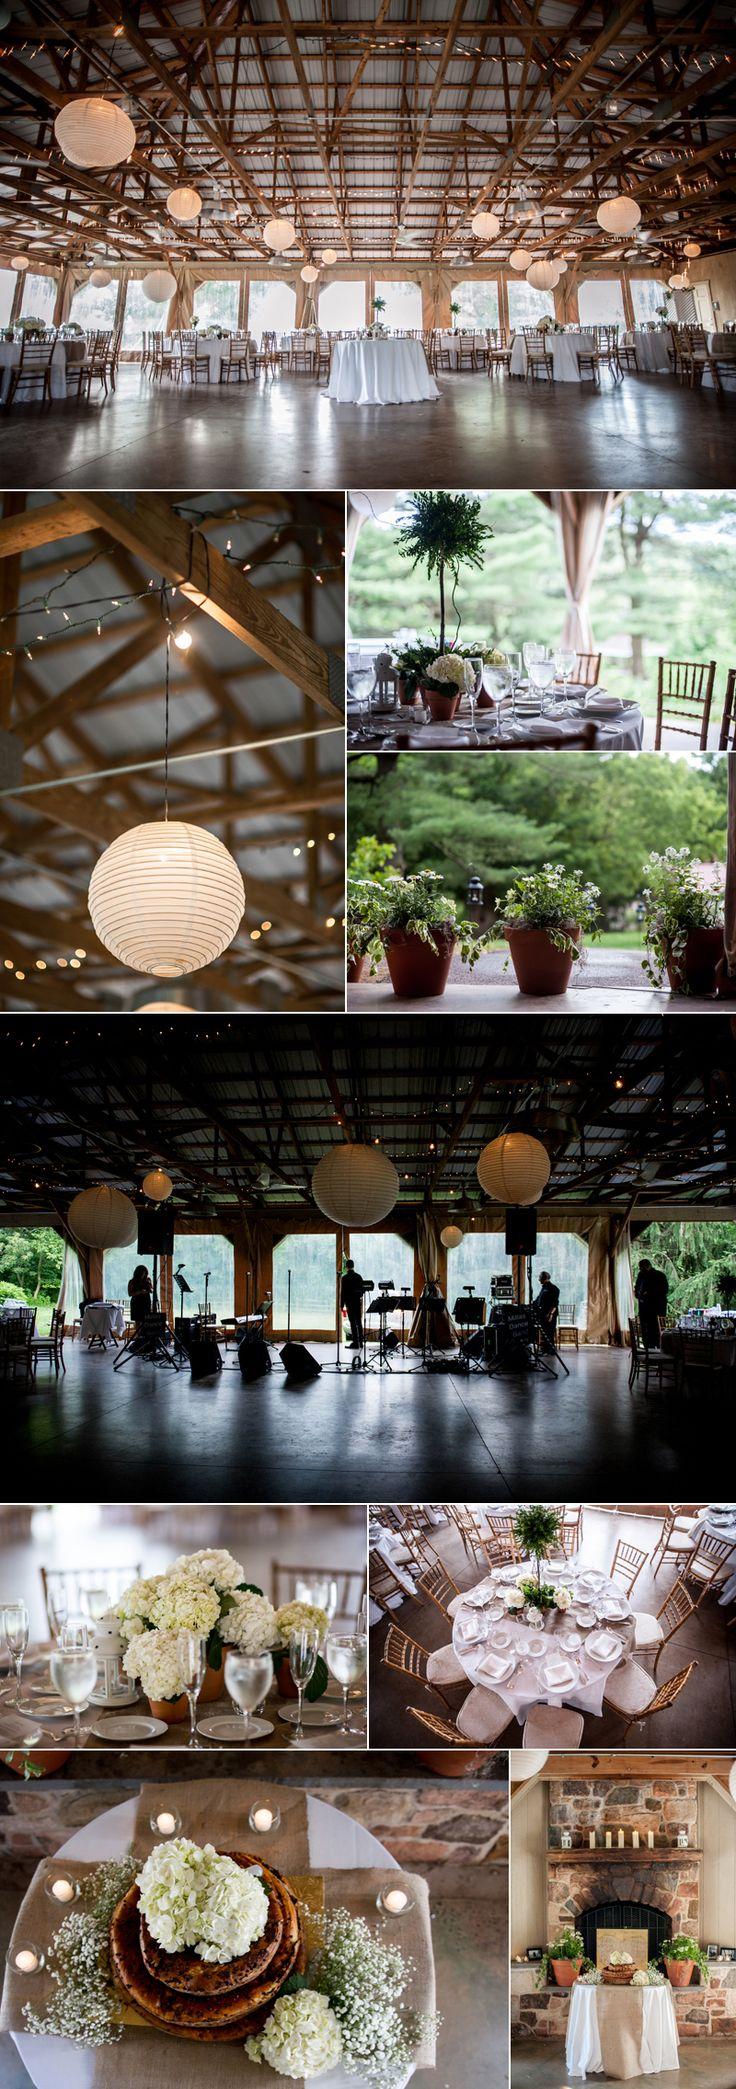 Pavilion at the John James Audubon Center. #phillyweddings #JAM